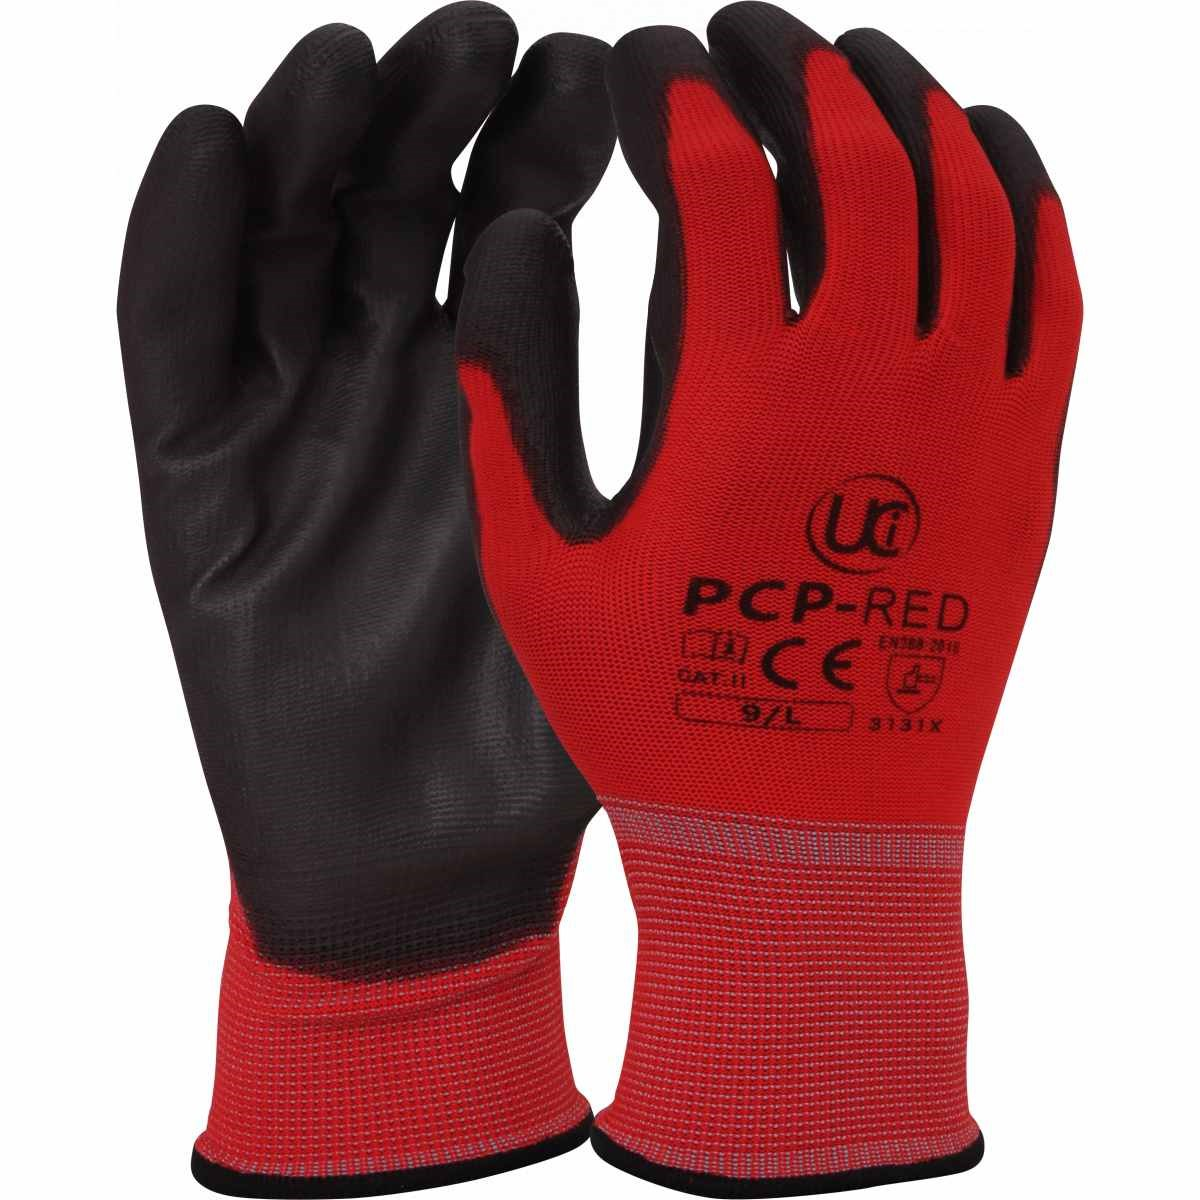 EC9 Gloves PU Coated Gloves Lightweight Black Large Size 9 B-Click Workwear PPE